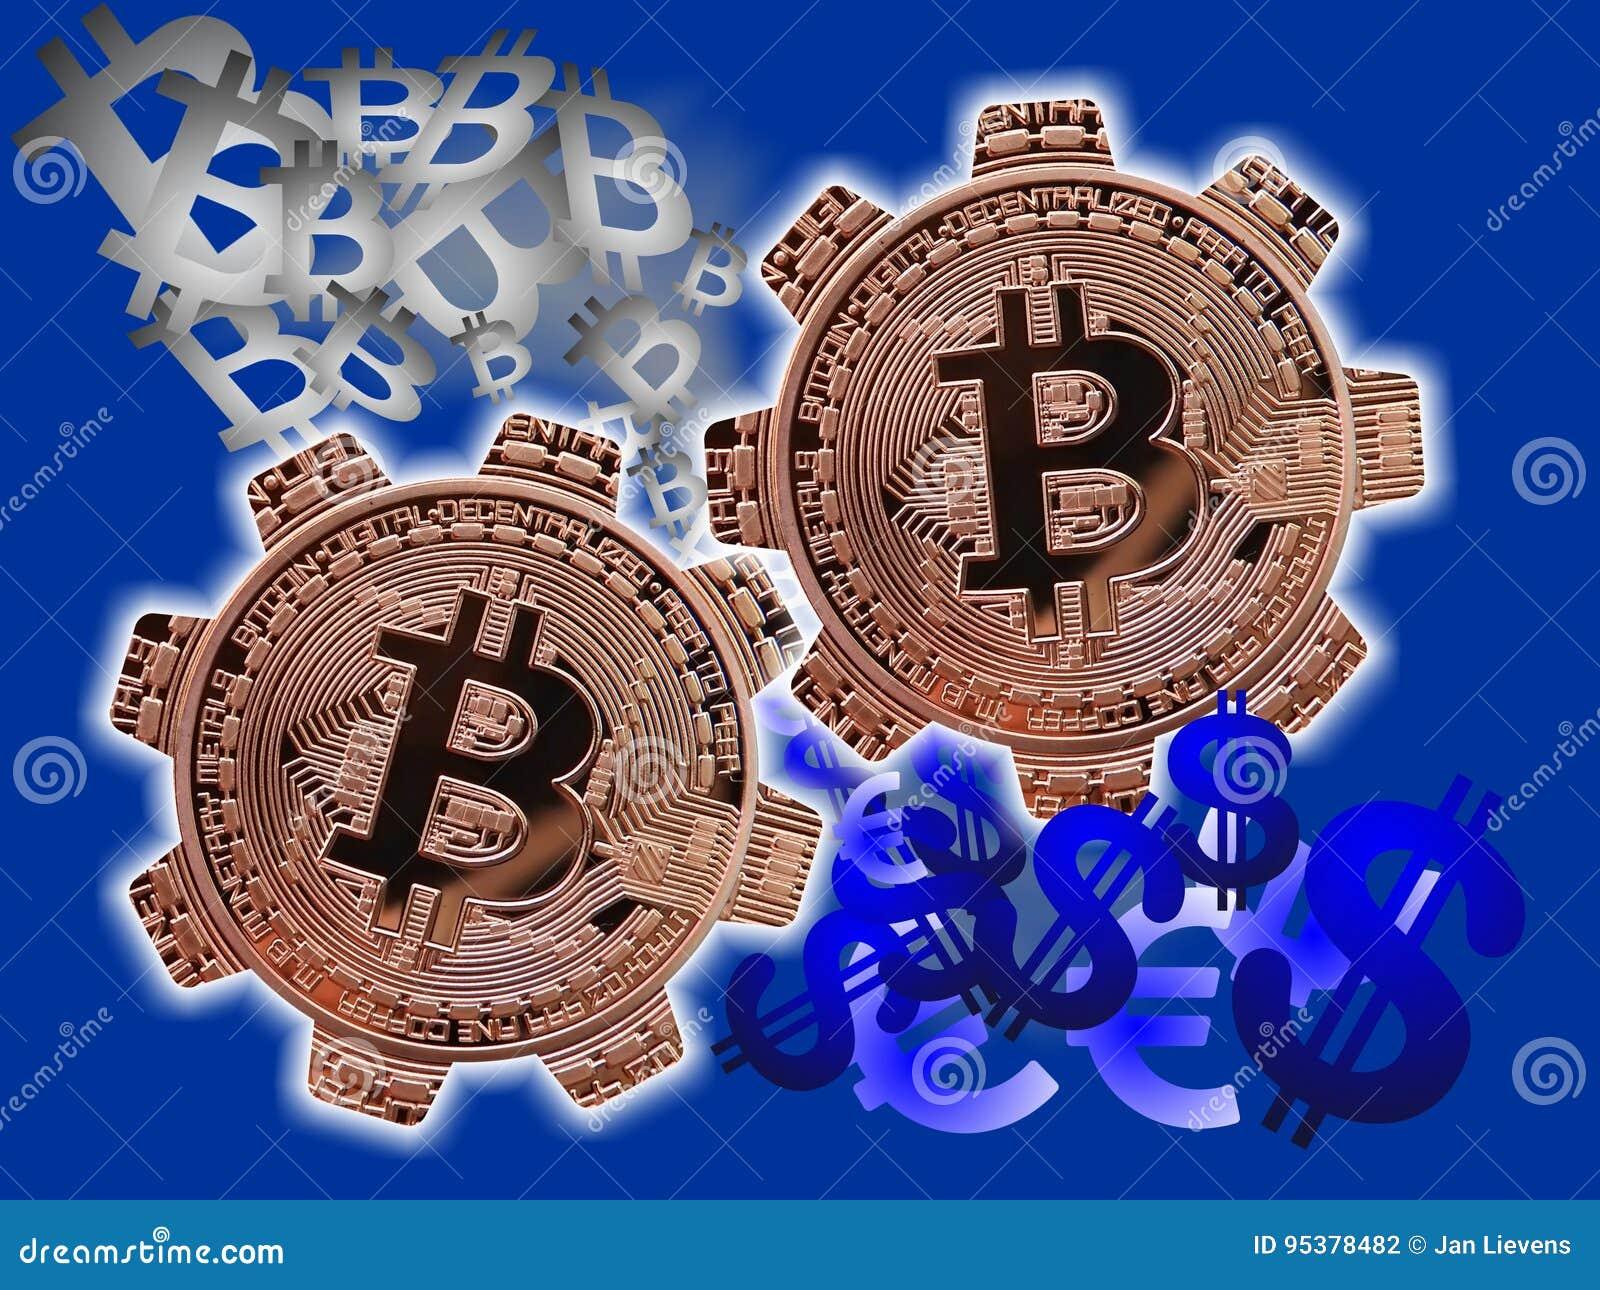 16 bitcoins in euro